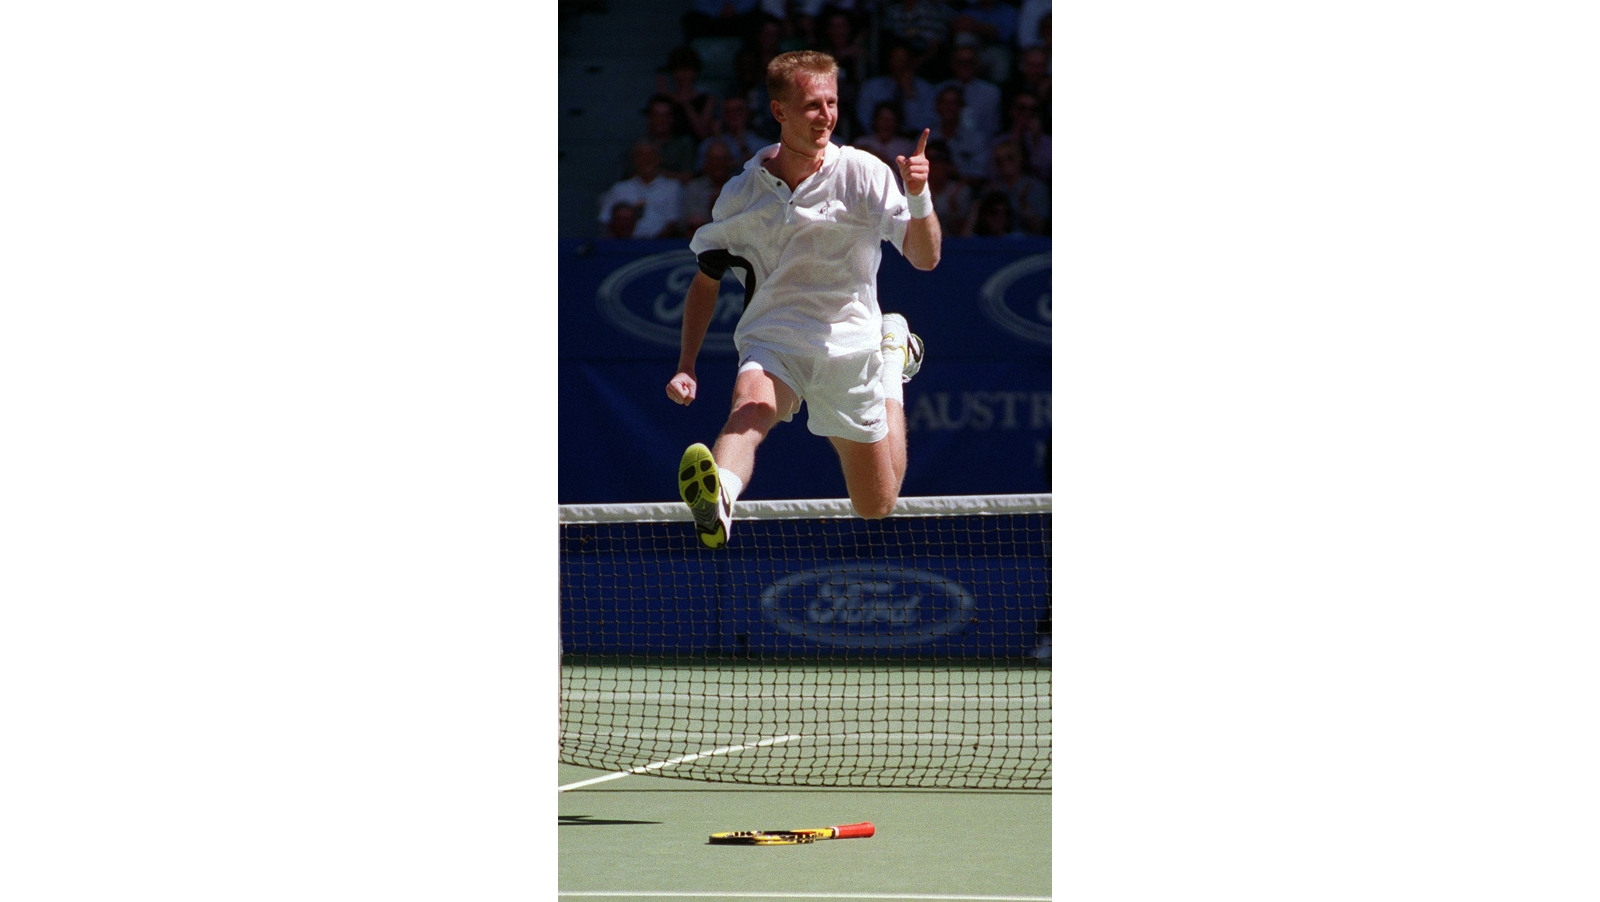 Ex-Tennisprofi Petr Korda beim Jubel (Photo by The Age / Getty Images)